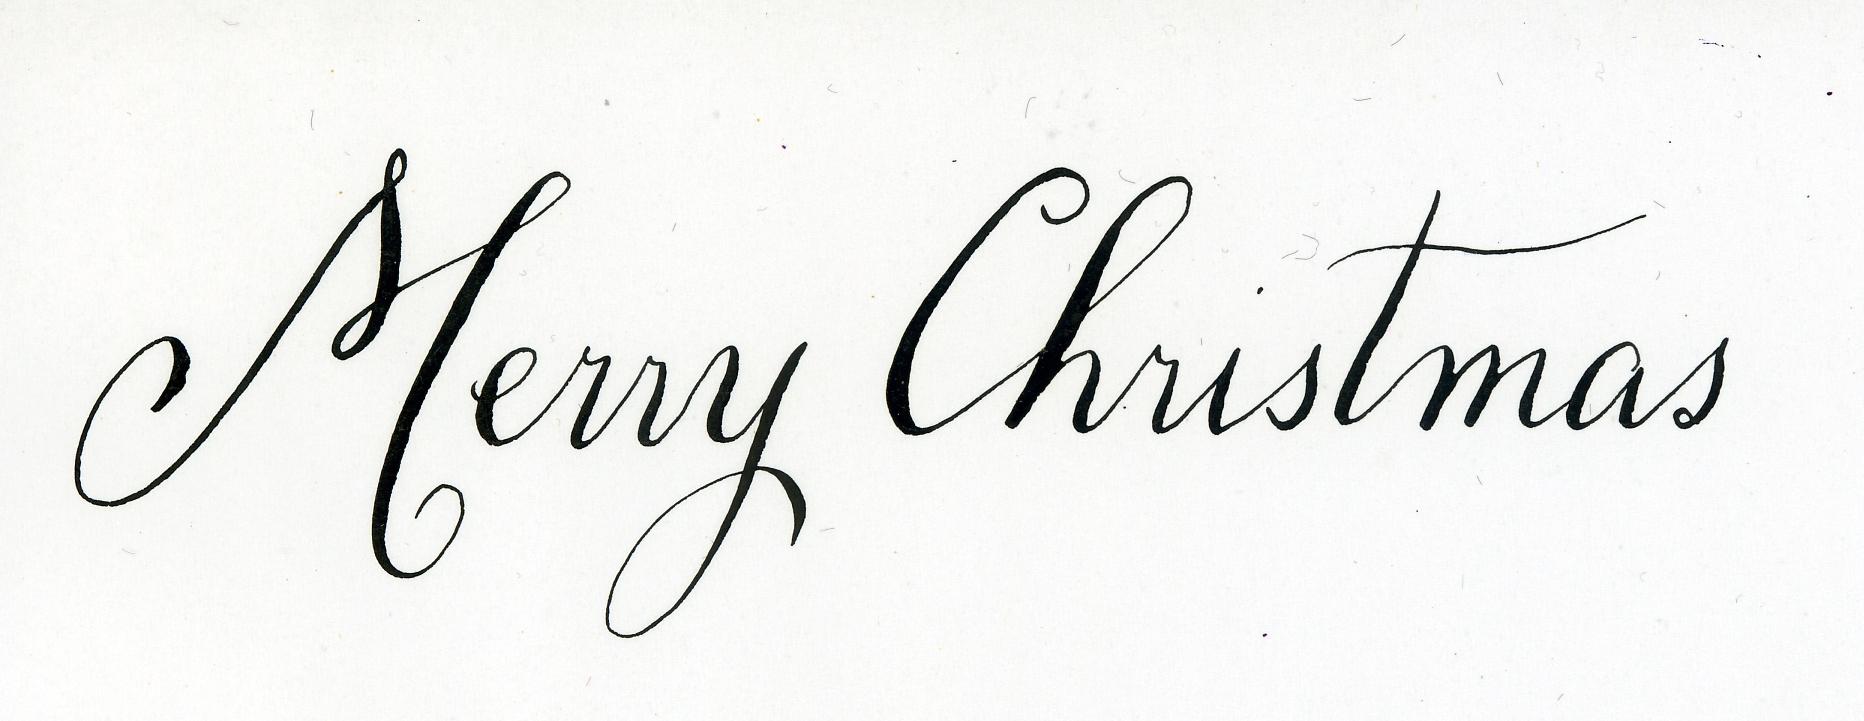 Merry Christmas Calligraphy.Merry Christmas Calligraphy Handwritten Life